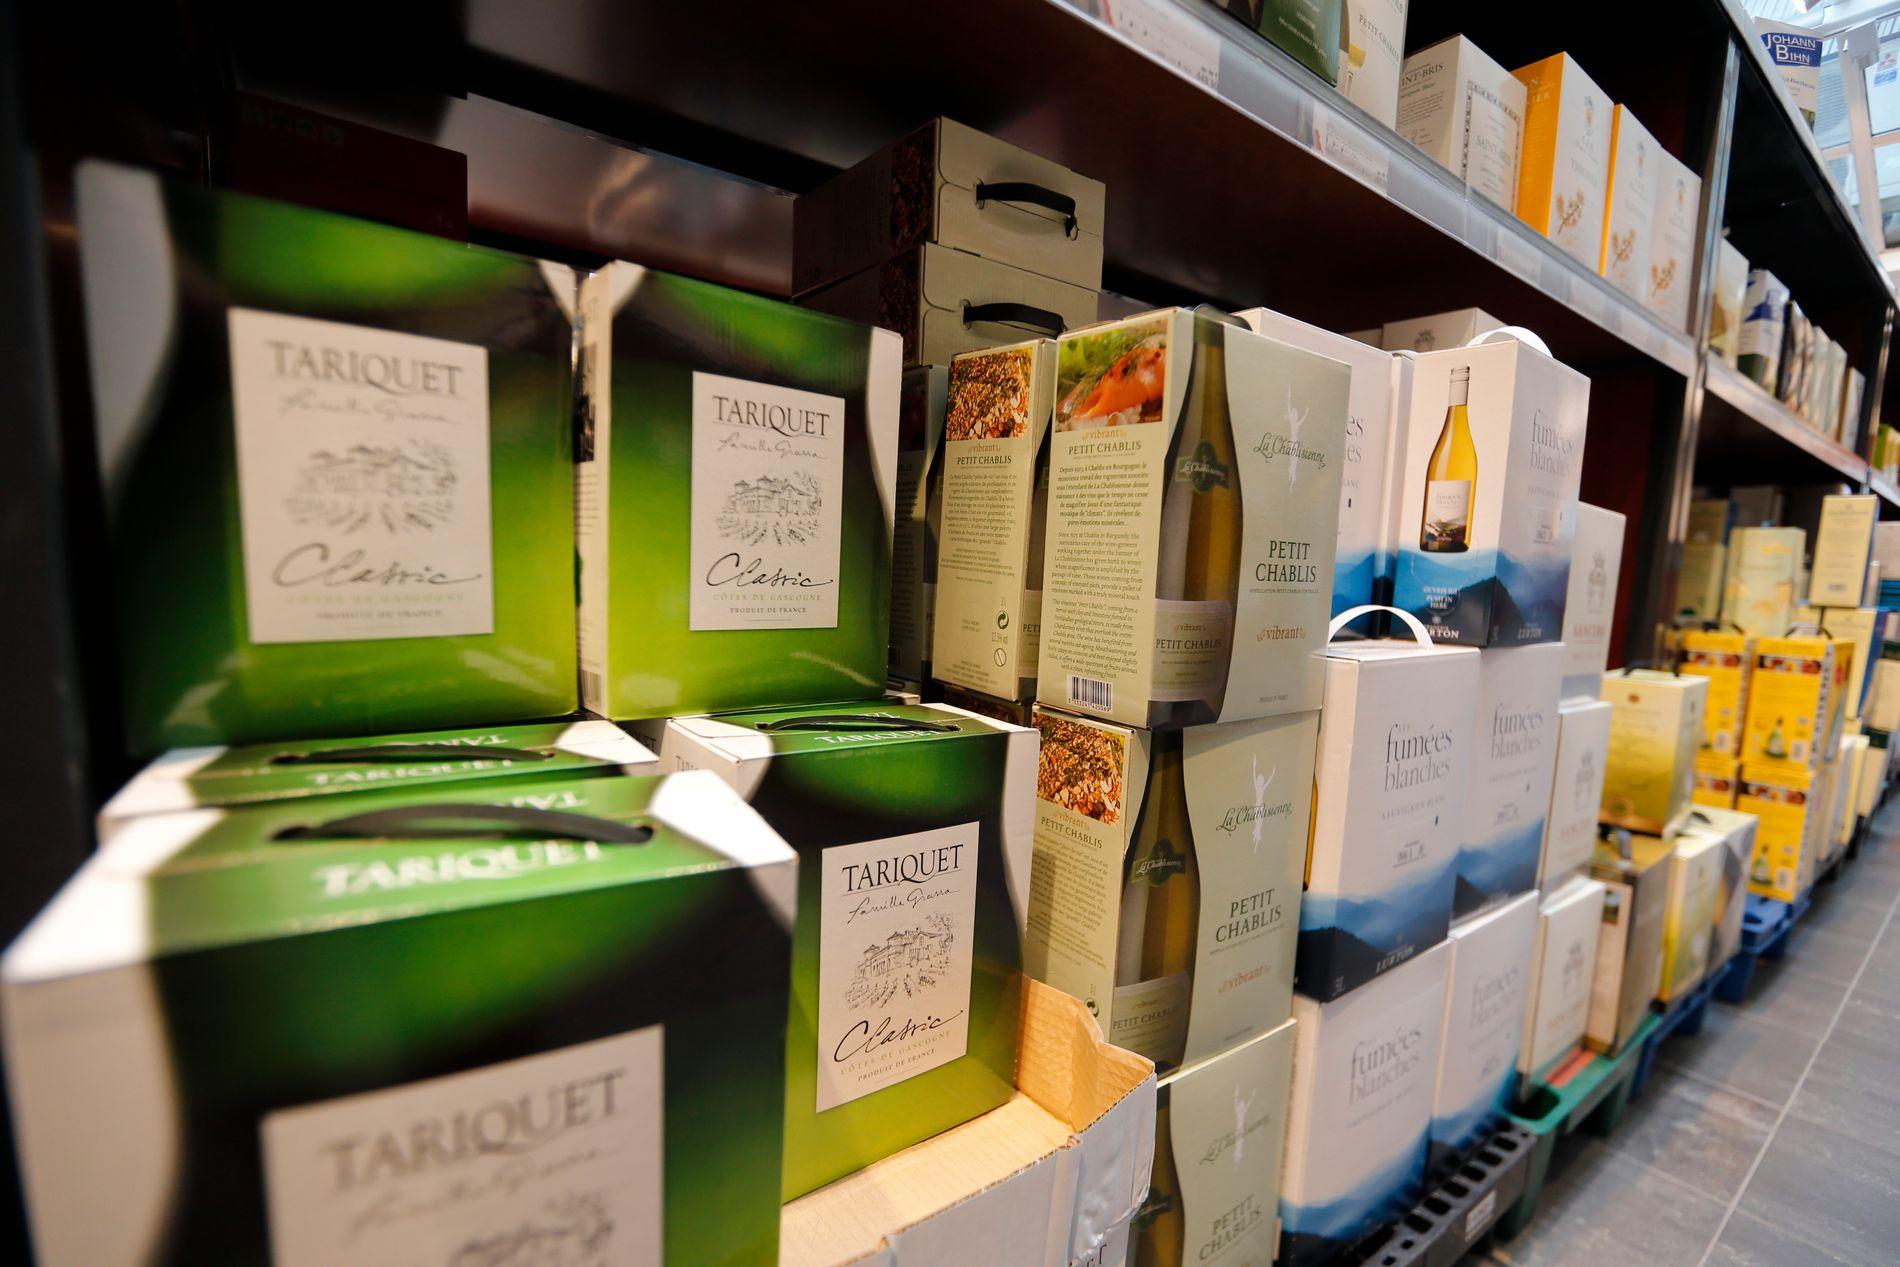 NORSK KULTUR: «Vin er en del av norsk kultur, og avhold er en personlig sak. Har Helsedirektoratet virkelig ikke bedre forslag til Norges helse enn pappvinforbud», skriver innsender.